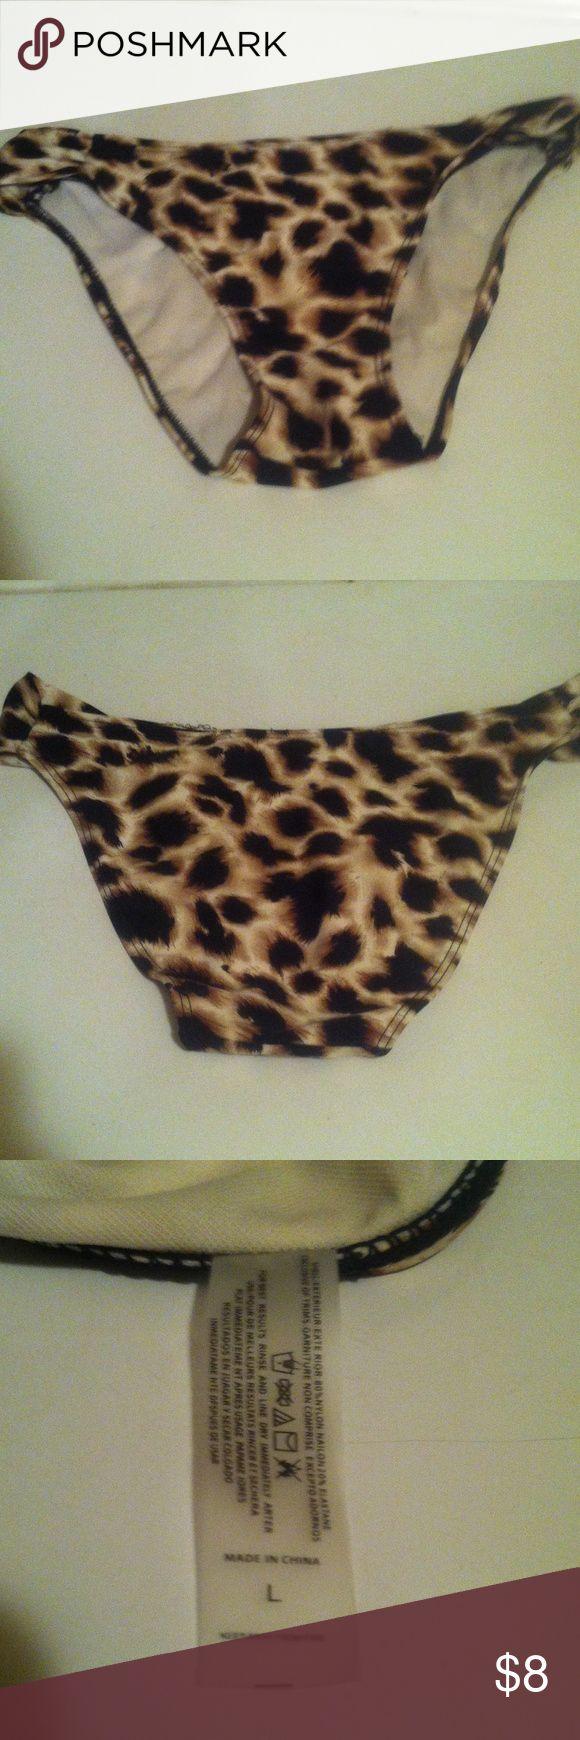 Girls Animal print bikini bottoms Girls Leopard print bikini bottoms. Size L, in juniors Swim